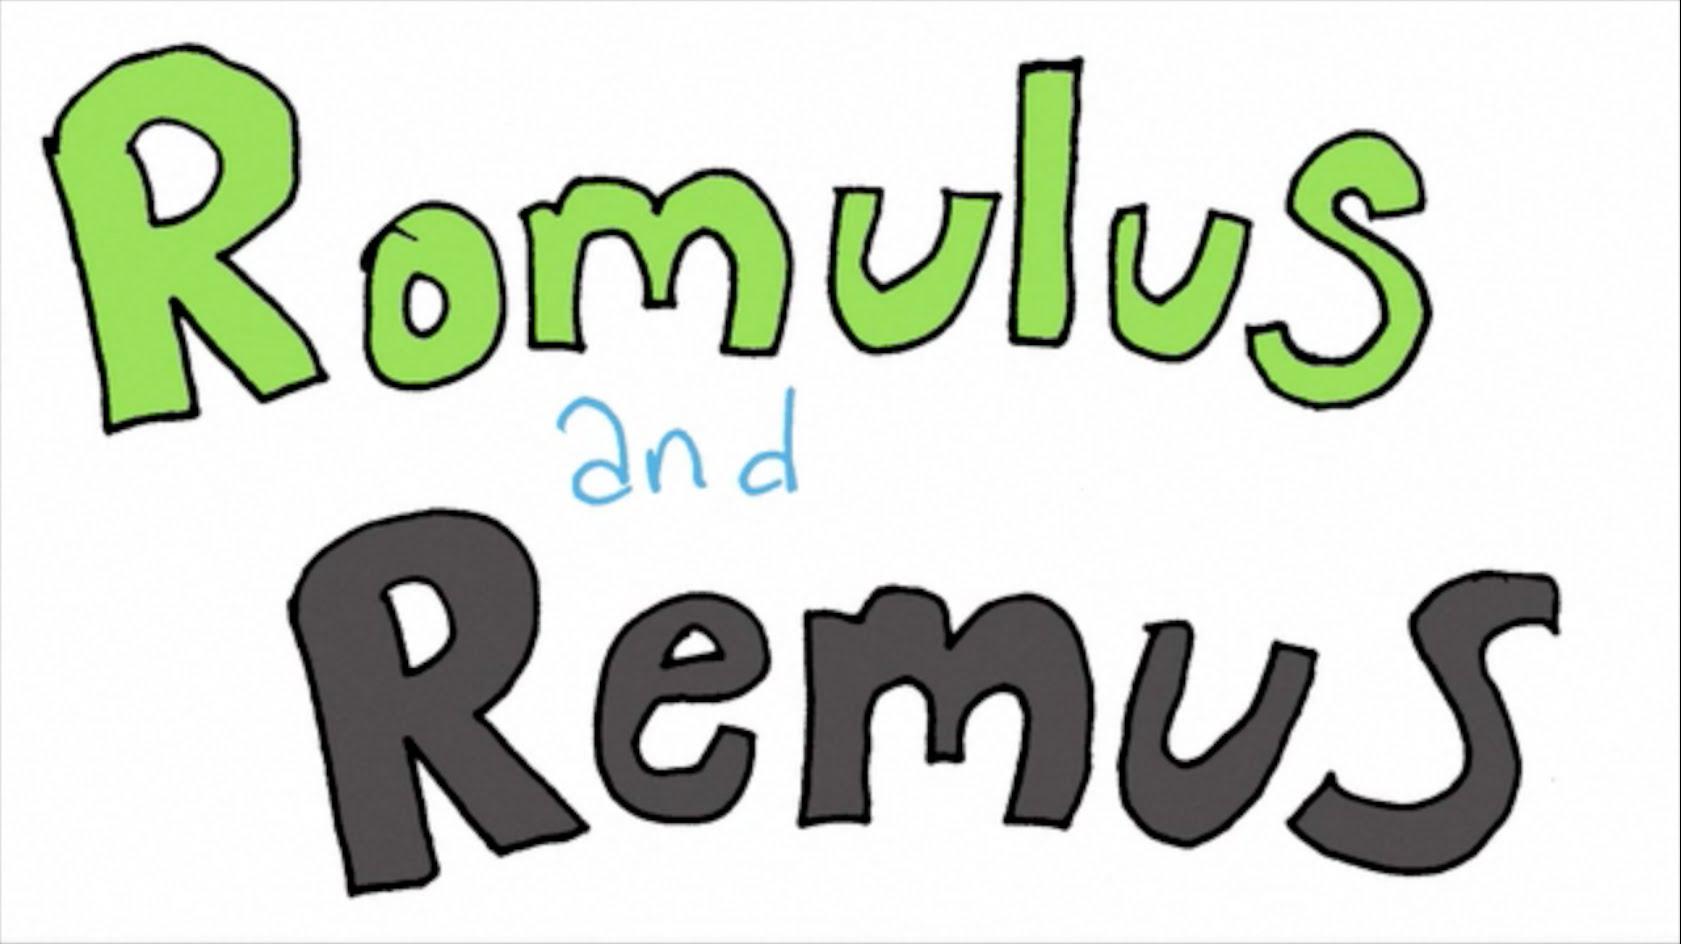 Empire clipart romulus and remus Romulus Romulus YouTube Remus and